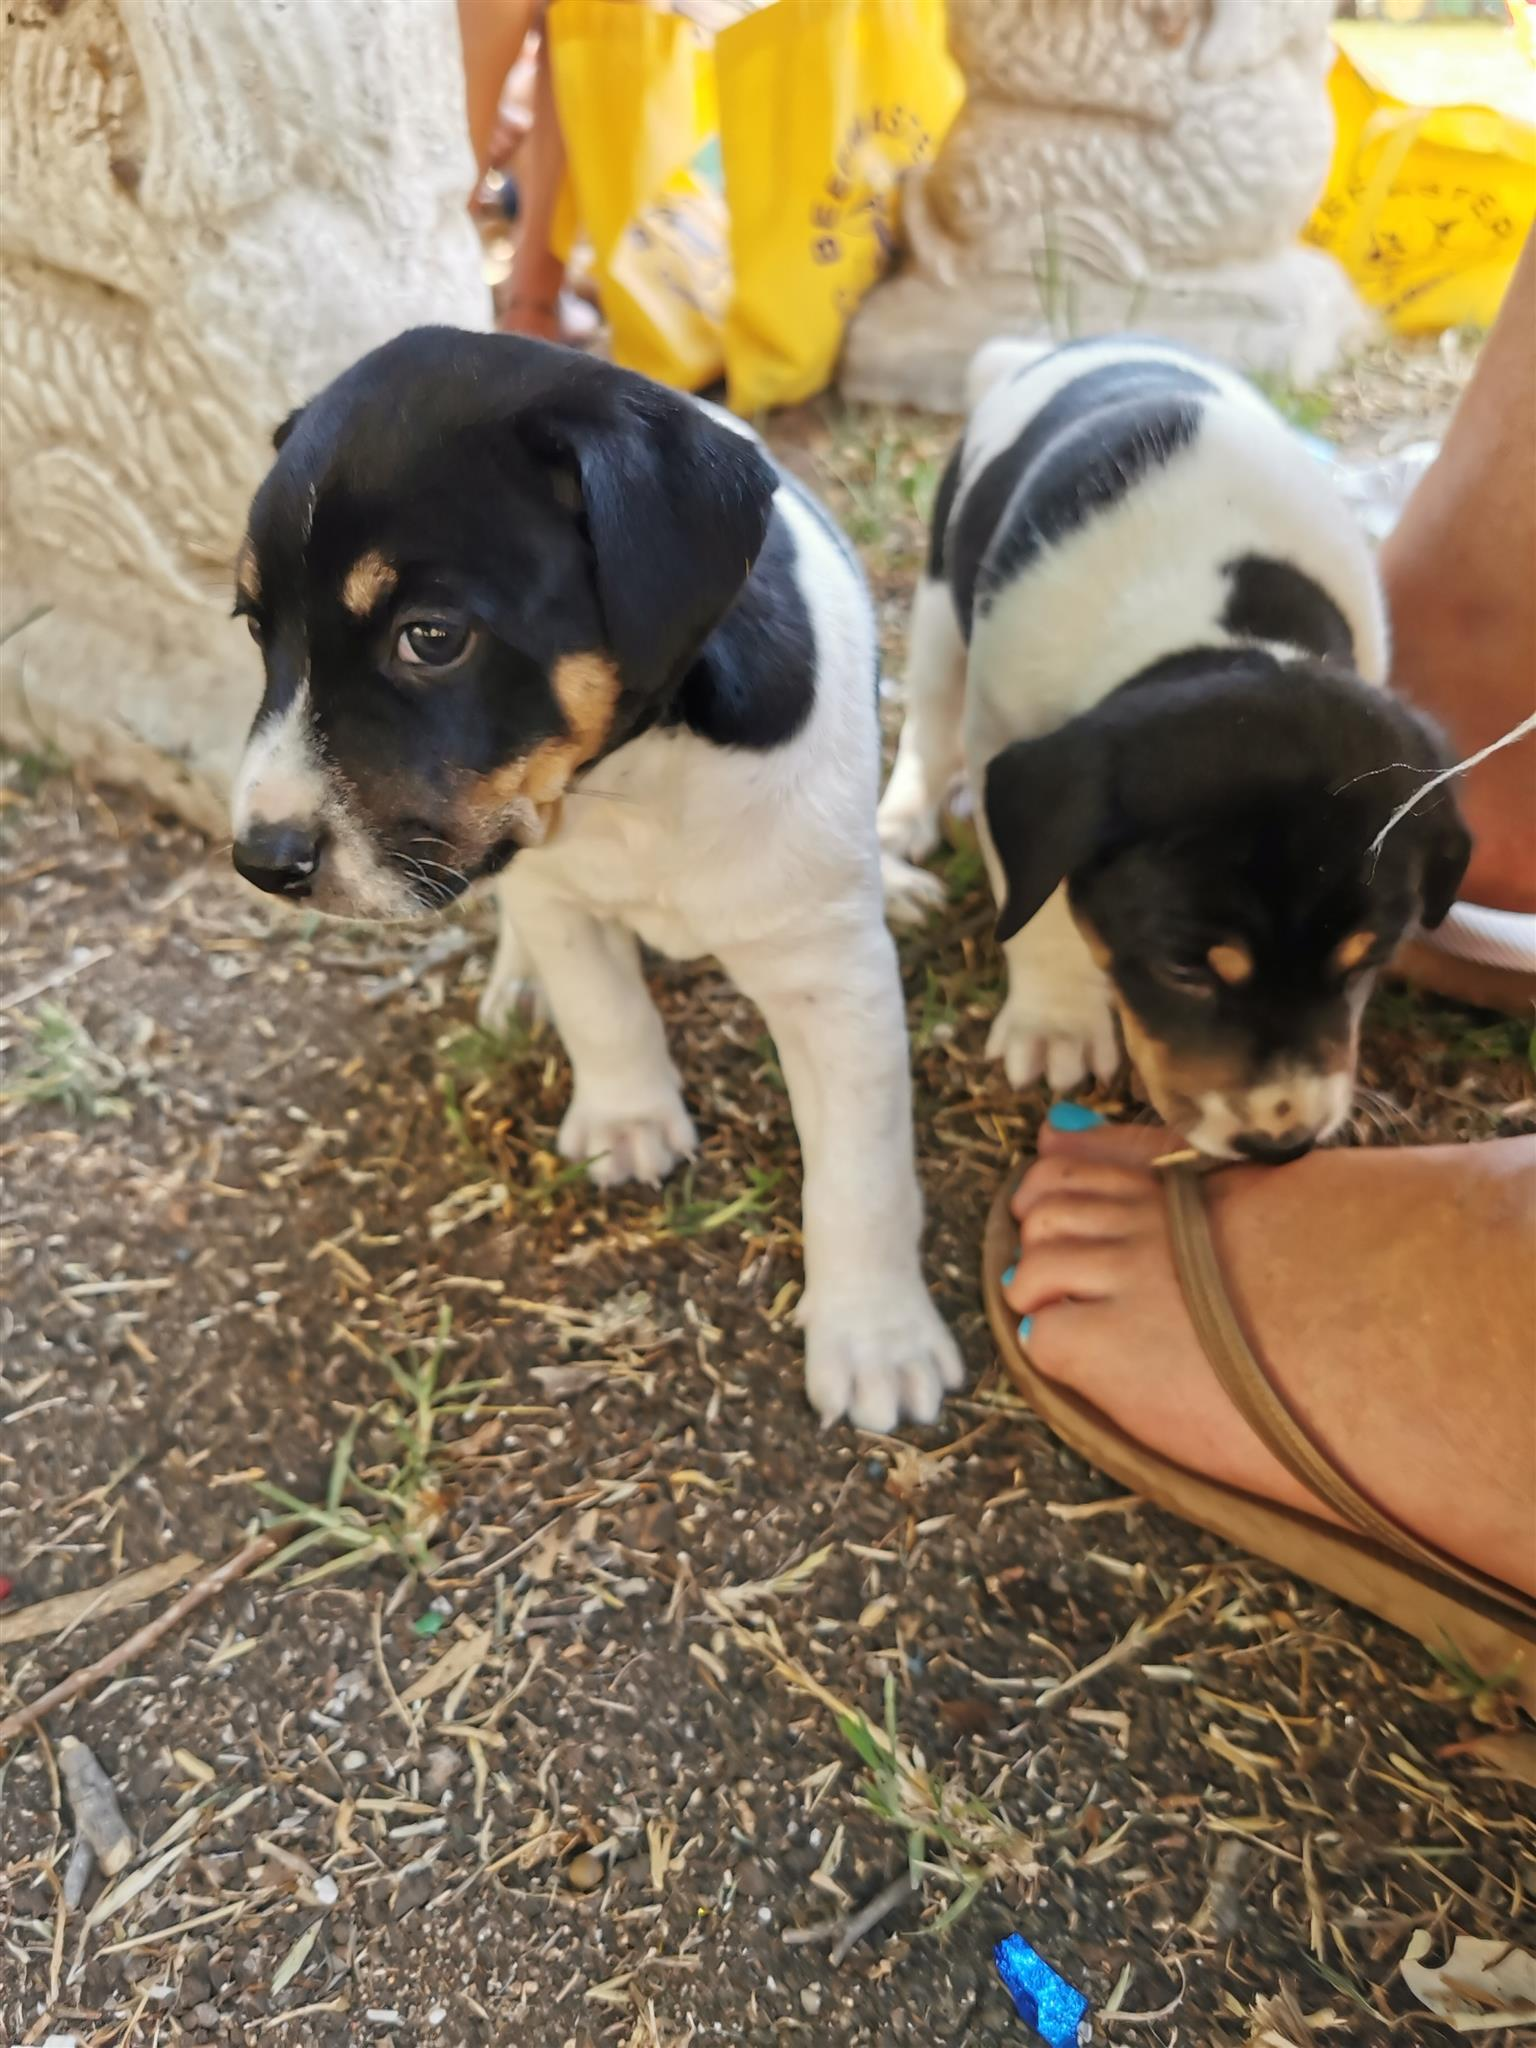 Foxterrier puppies